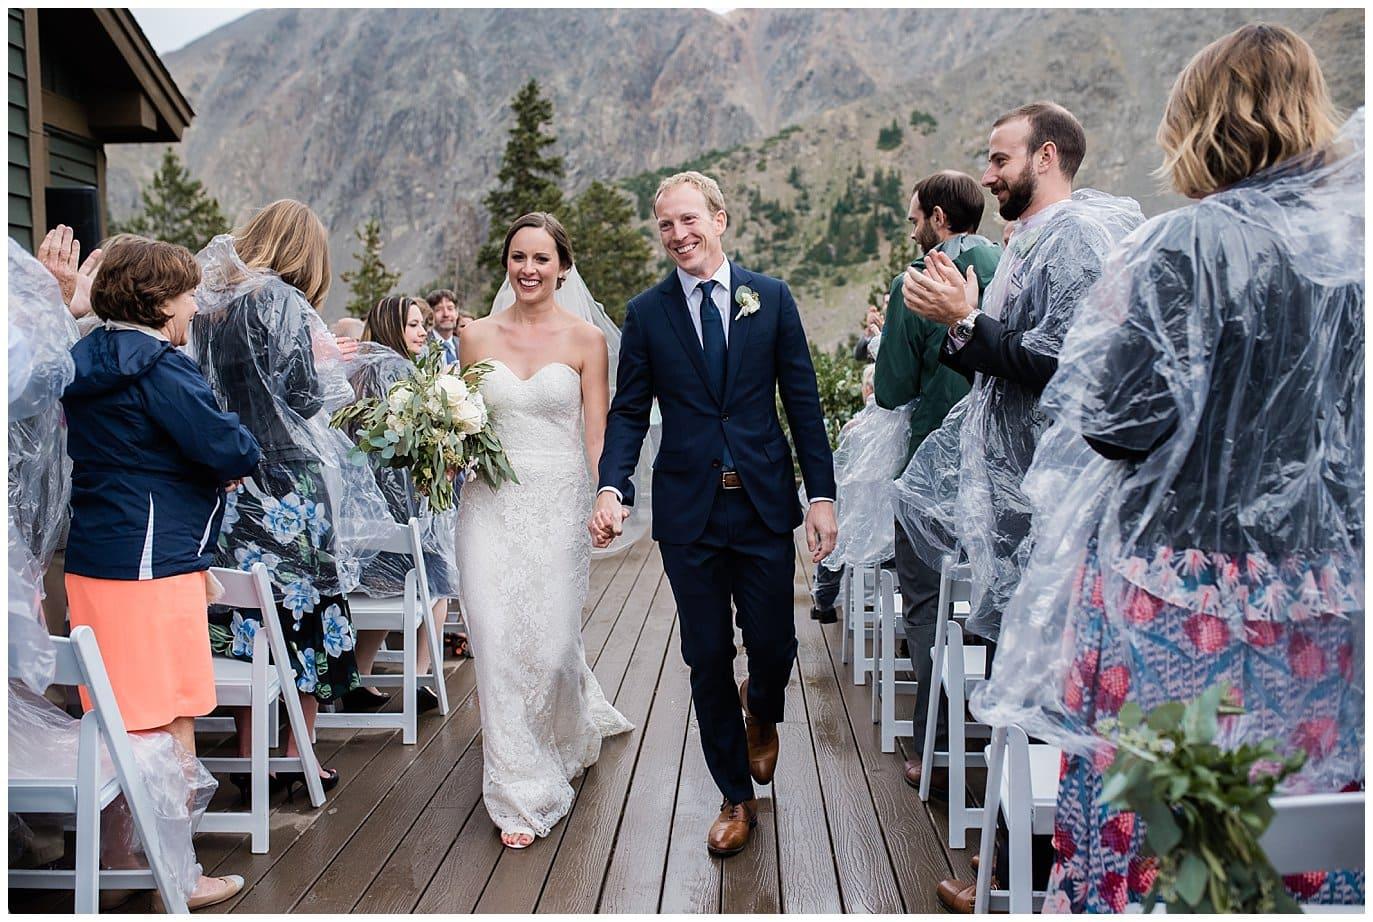 bride and groom walk down aisle at rainy Arapahoe Basin Black Mountain Lodge Wedding by Dillon Wedding Photographer Jennie Crate